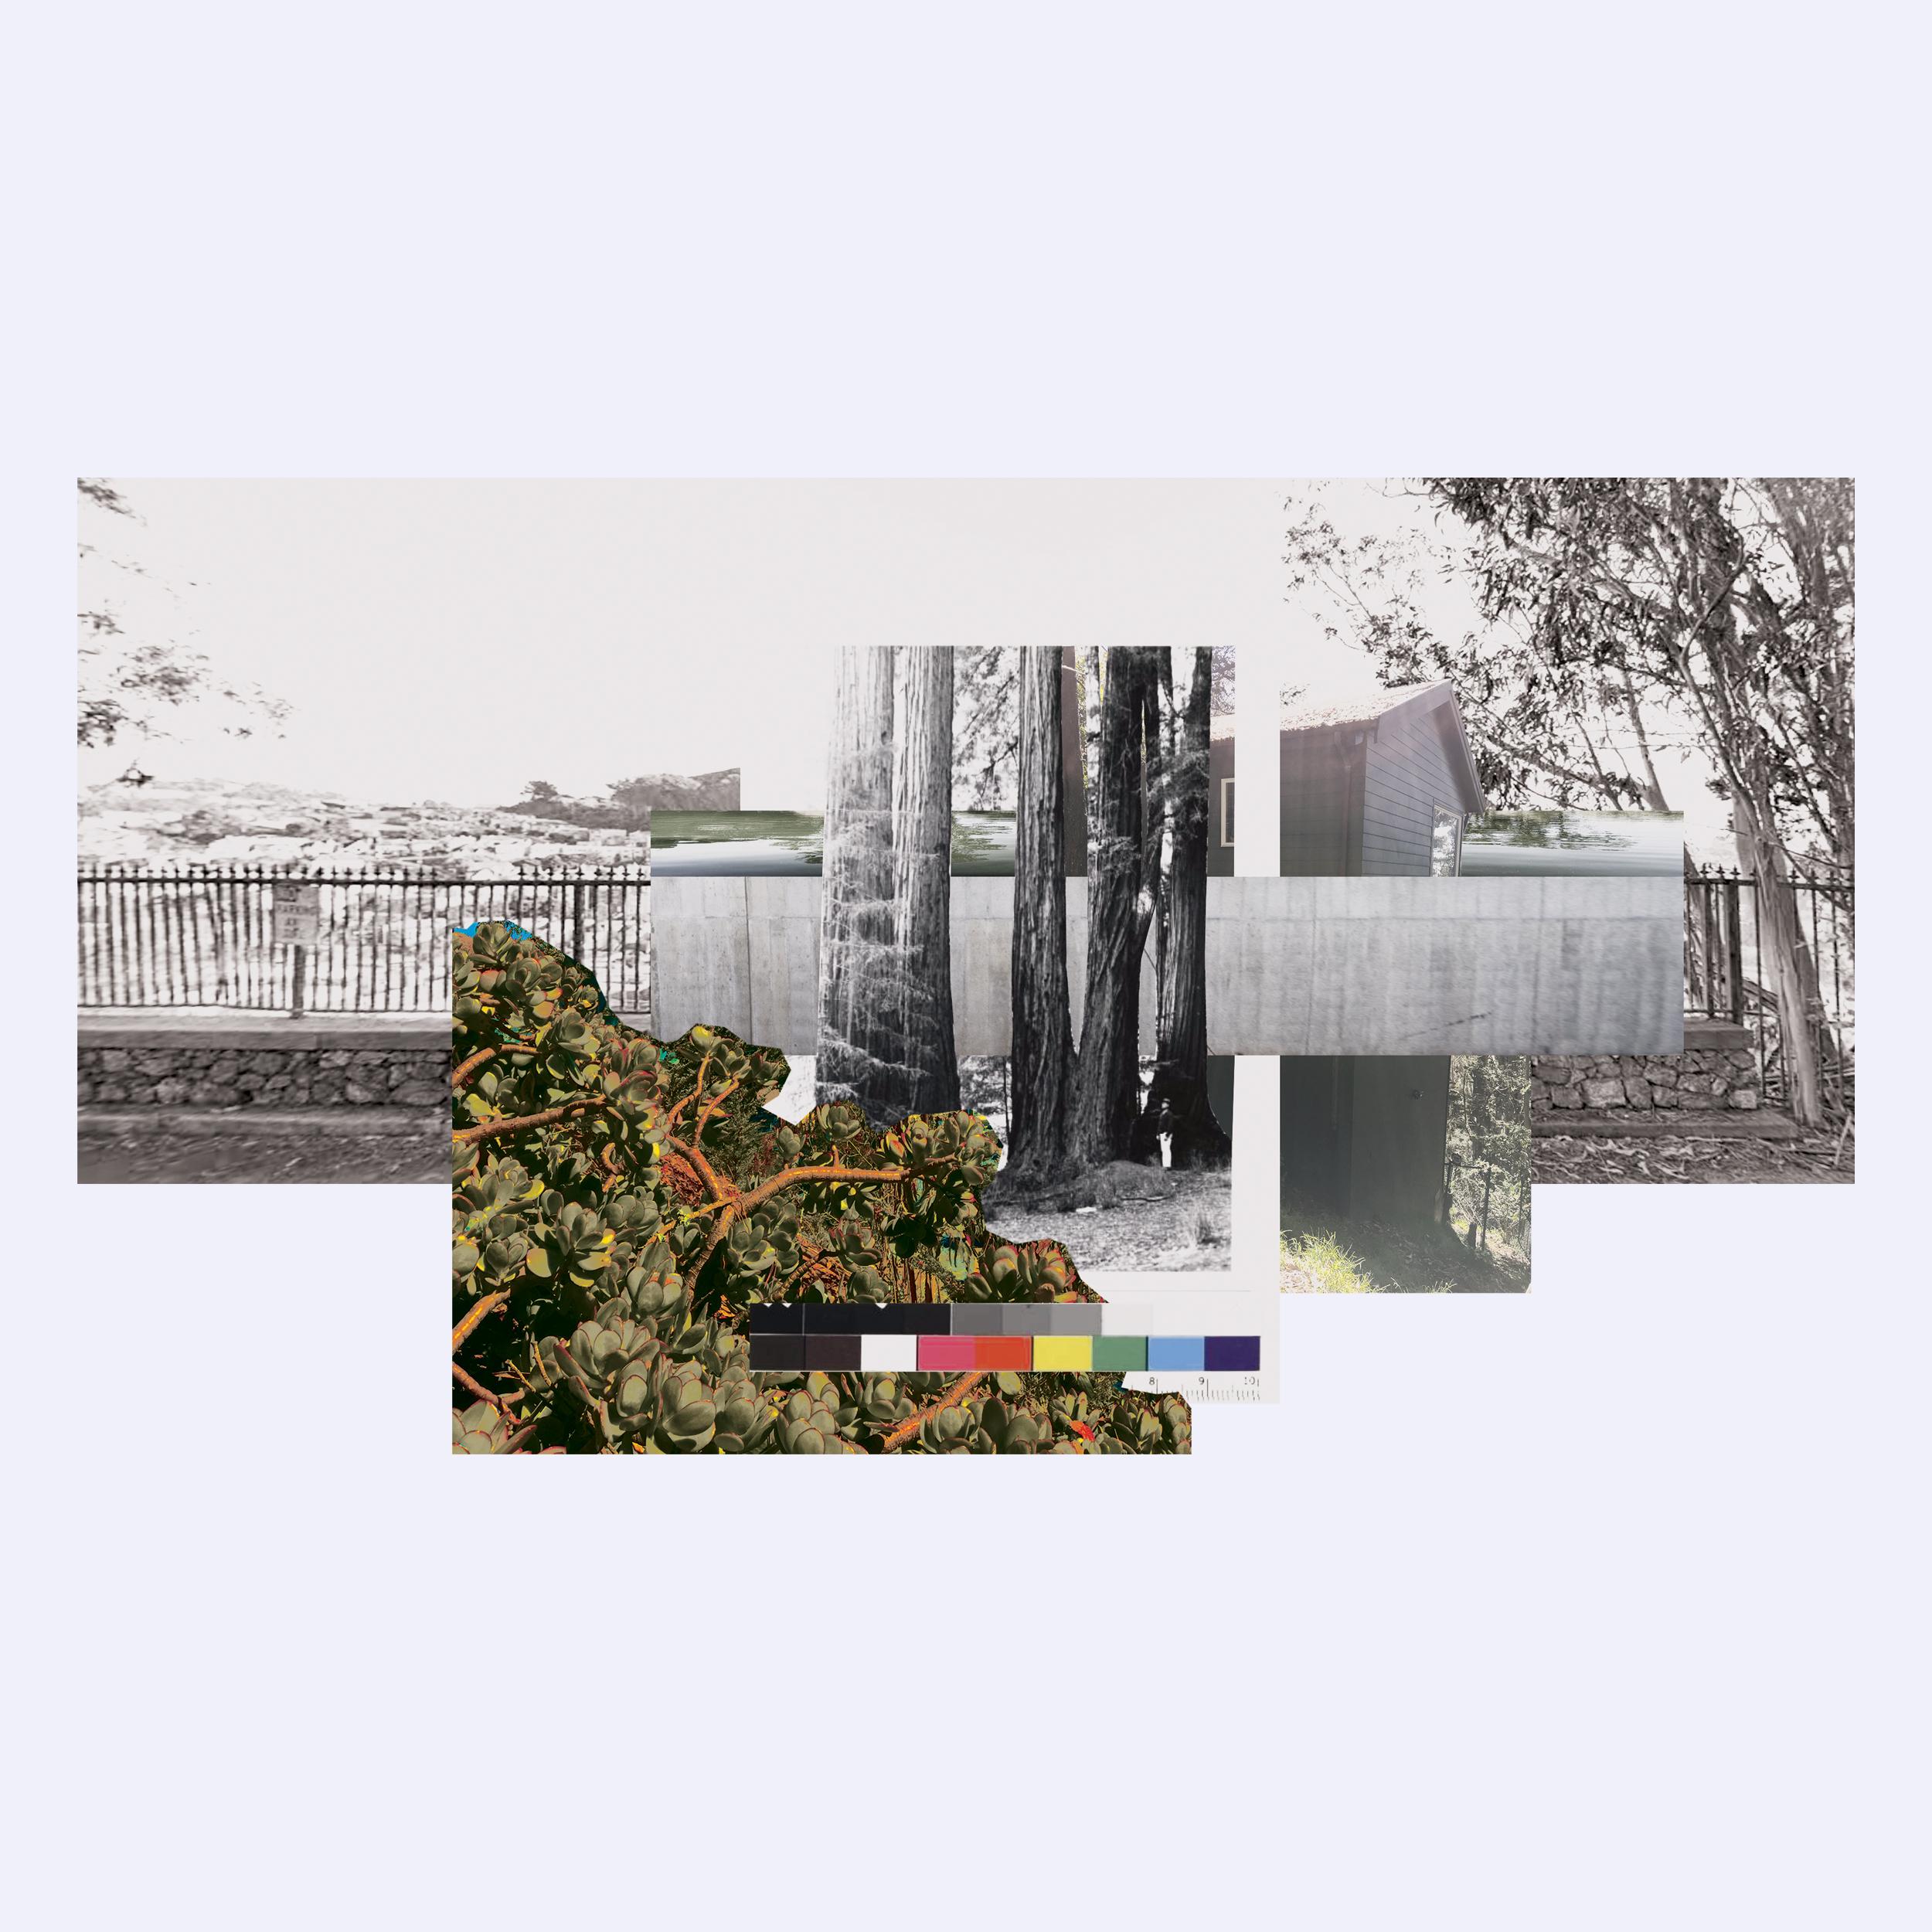 1_Collage.jpg